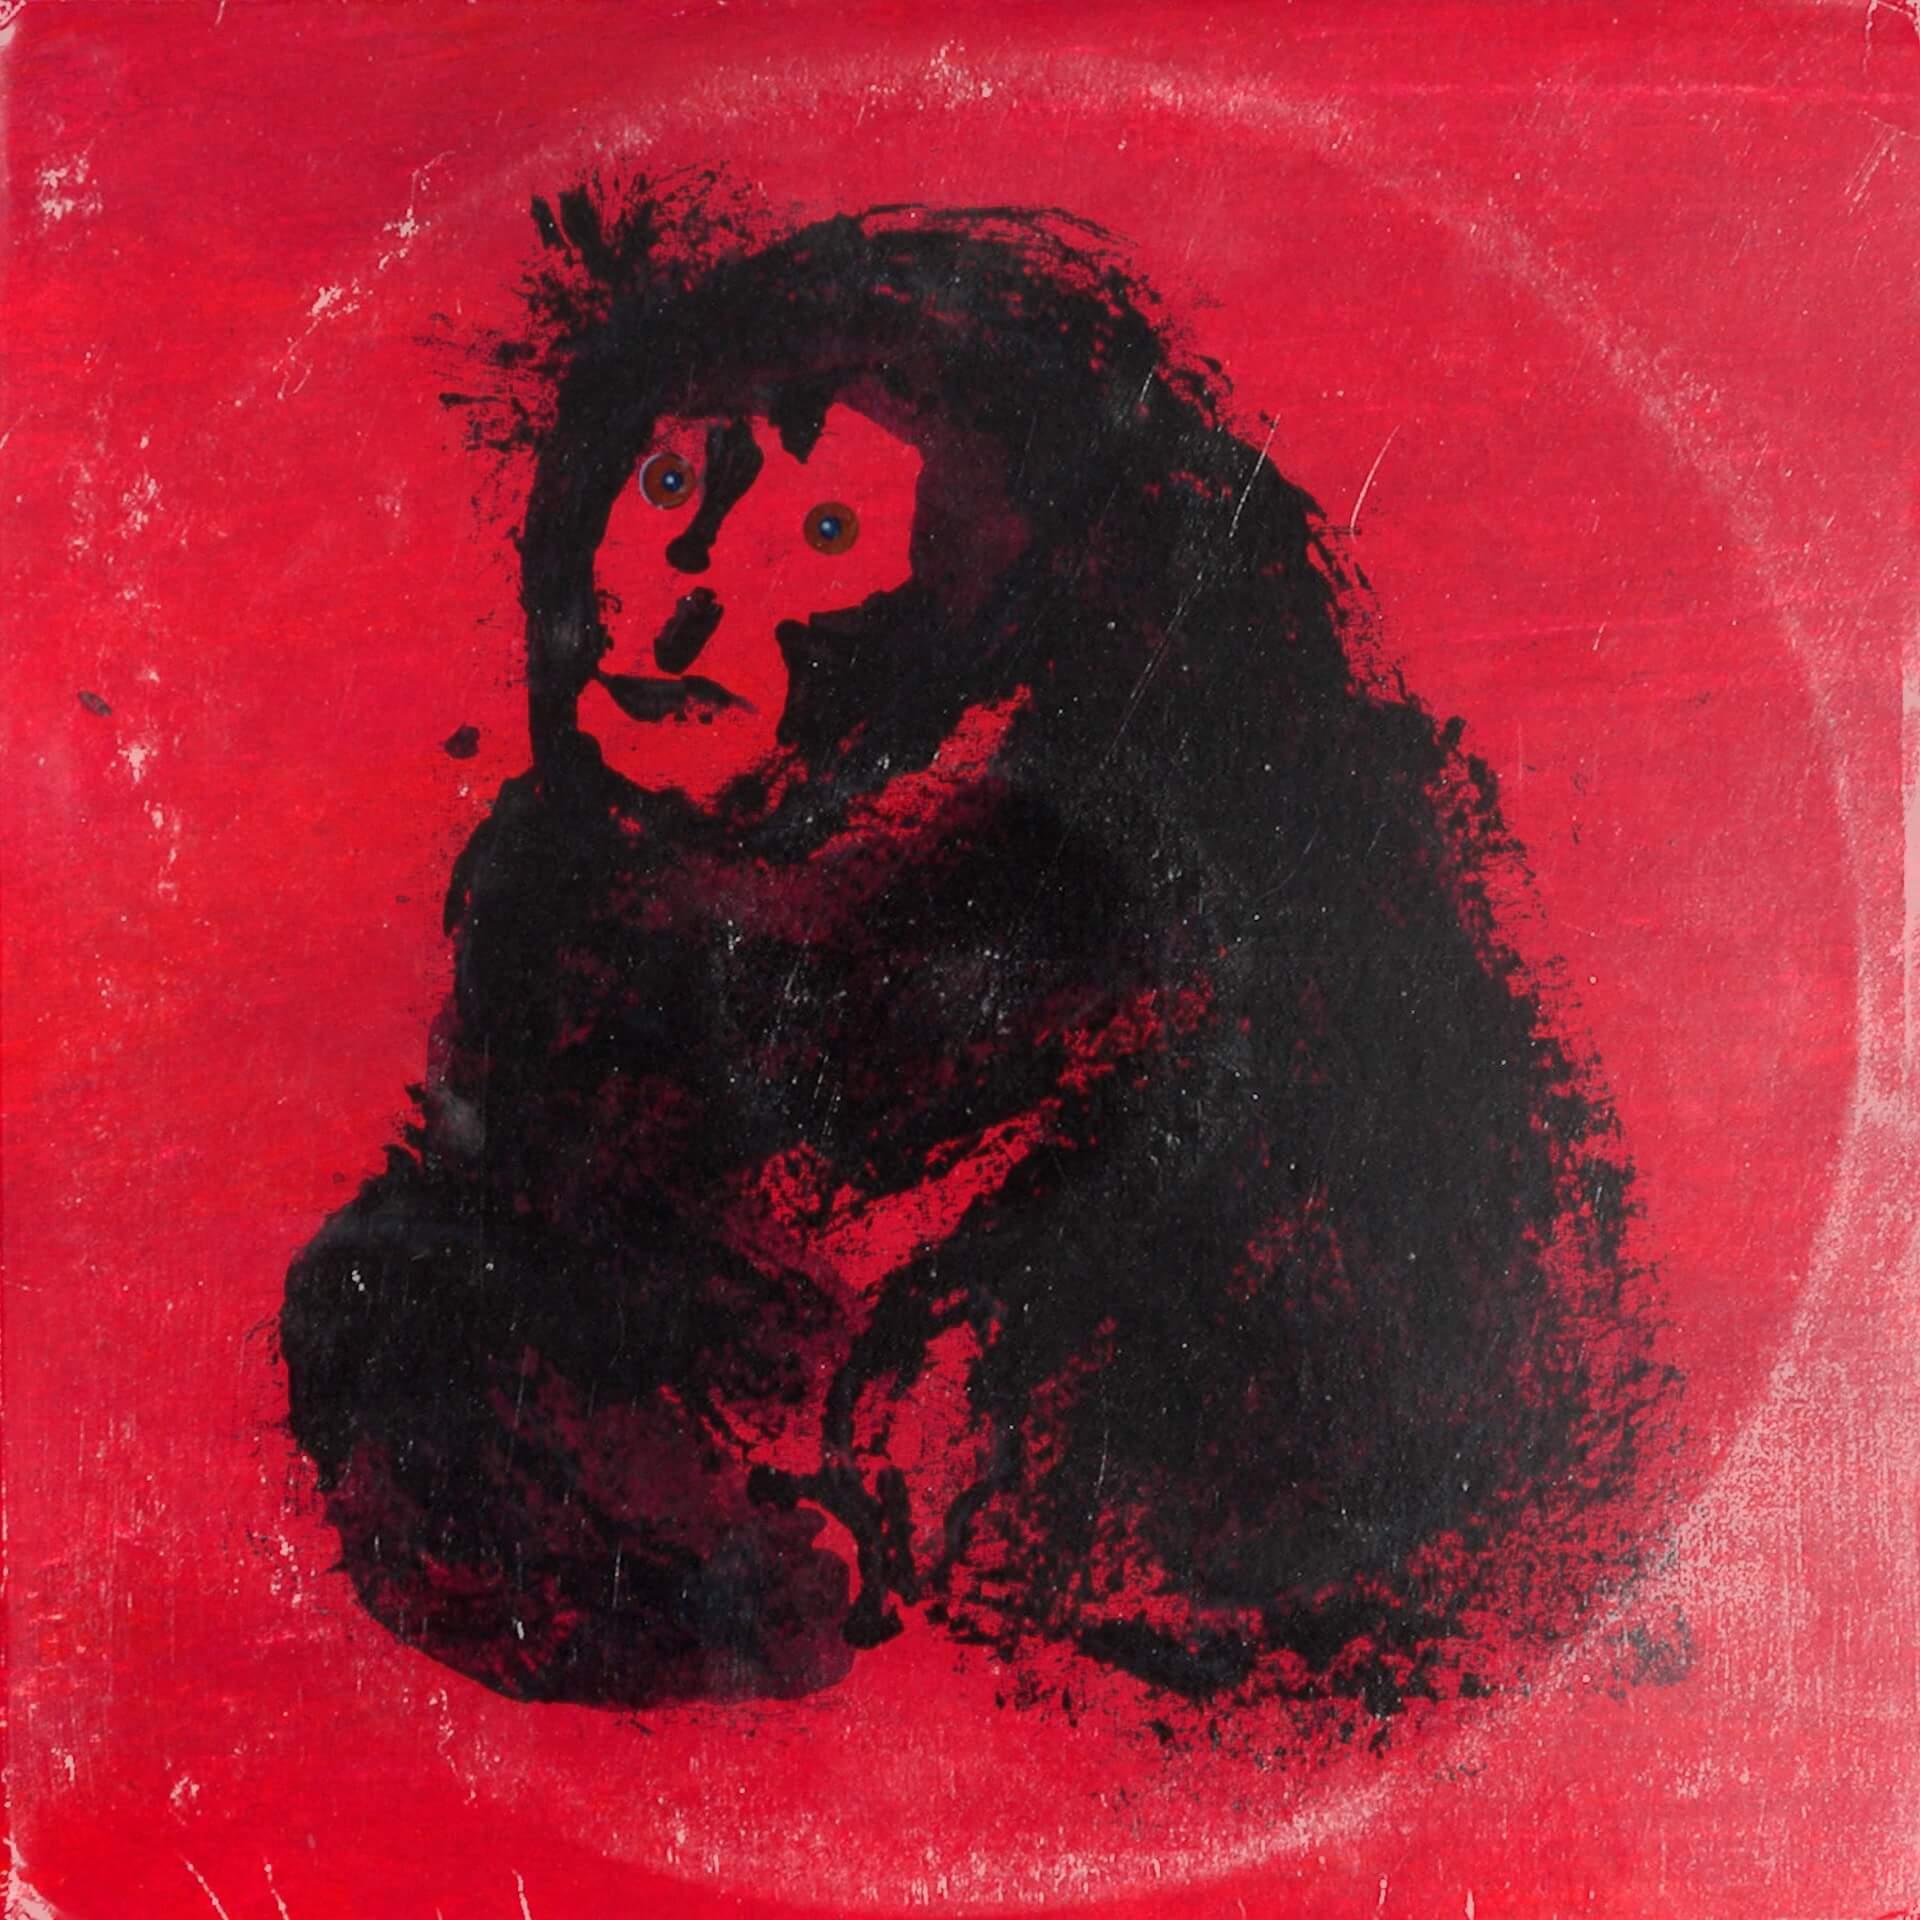 "Dos Monosニューシングル""Rojo""が本日よりデジタル配信中!『Dos City』以来1年ぶりのニューアルバムも今春リリース music200313_dosmonos_02"